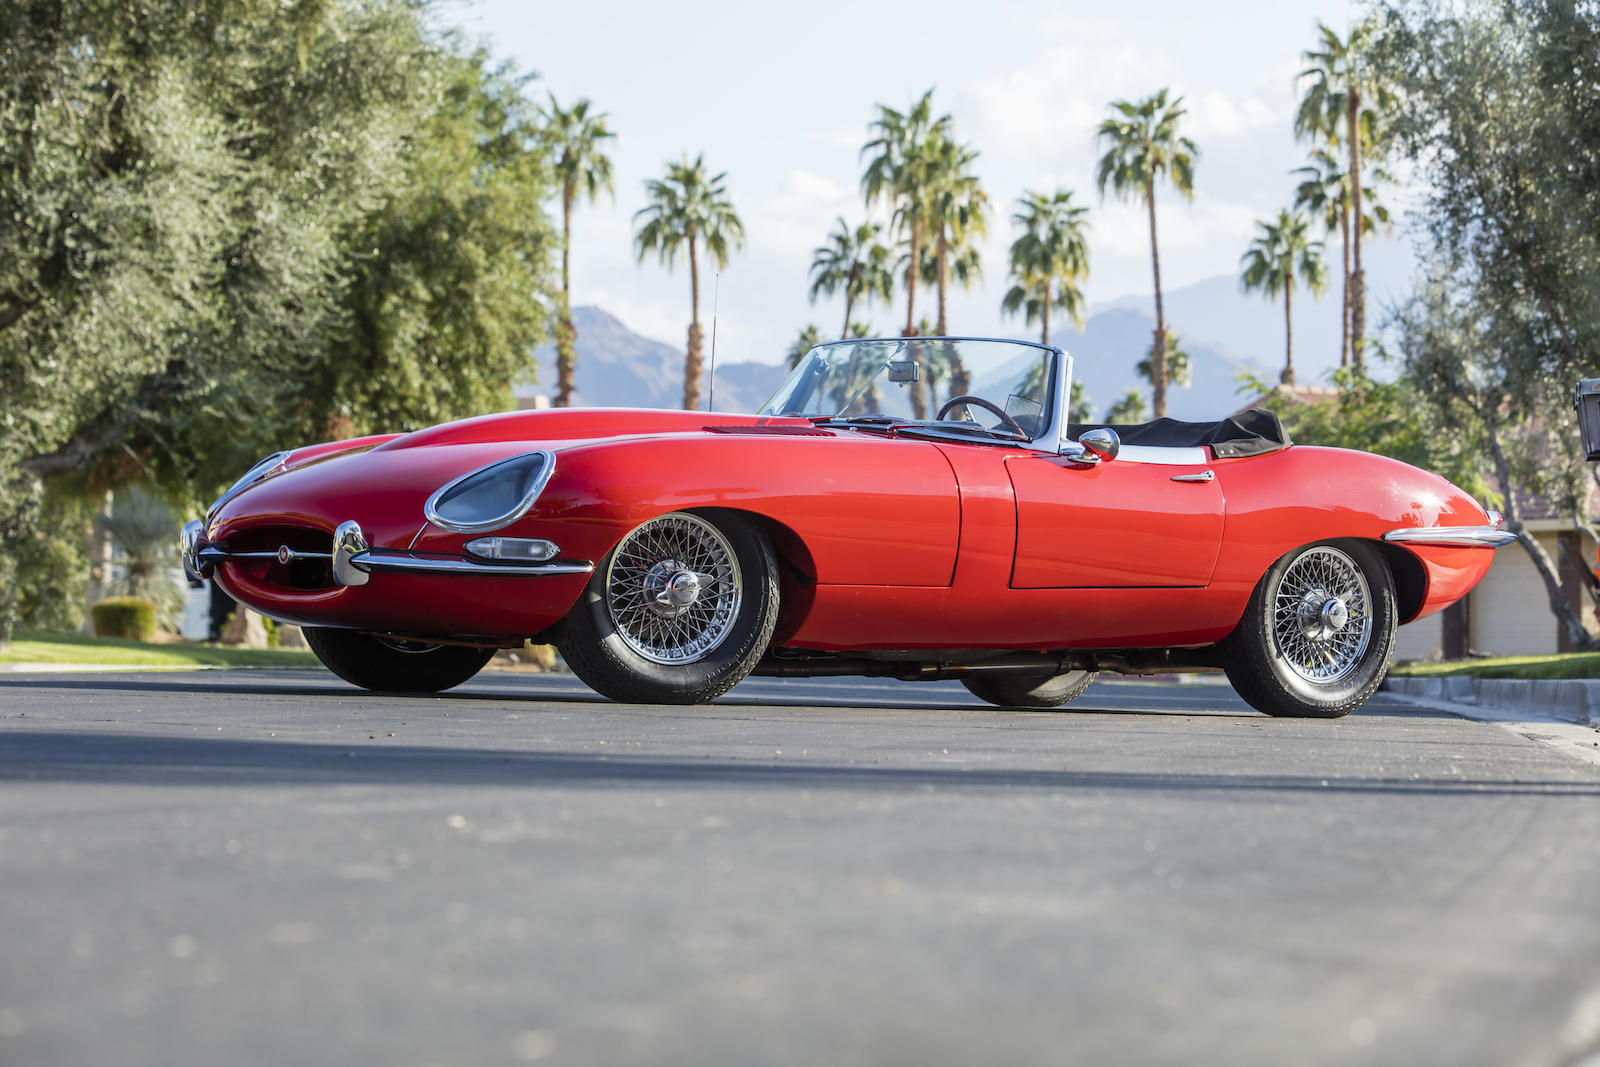 1963 Jaguar E-Type Series 1 3.8-Liter Roadster